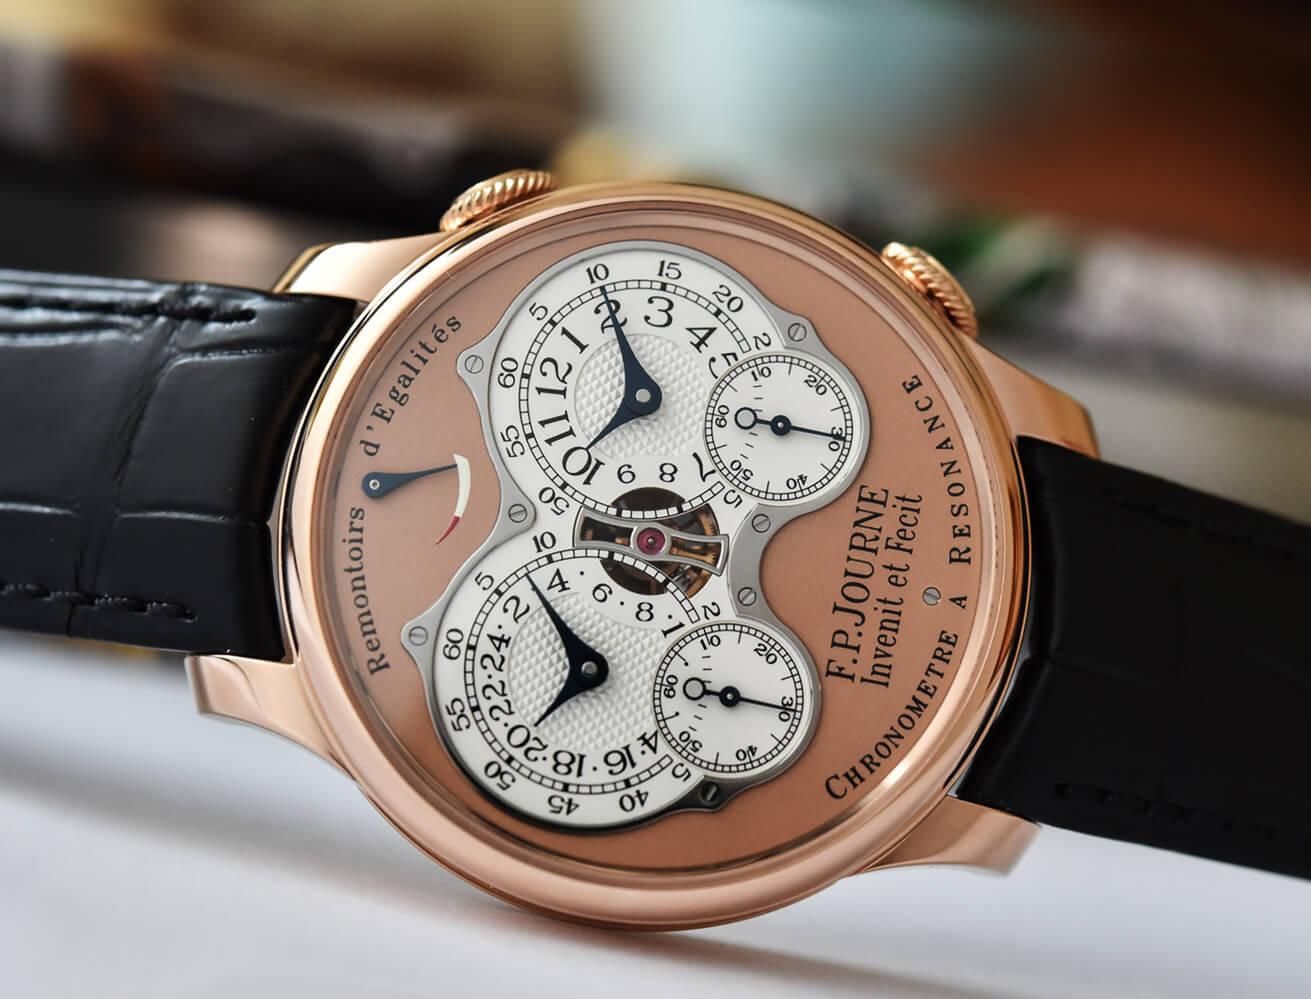 Часы F.P. Journe серии Chronomètre à Resonance «Souscription»